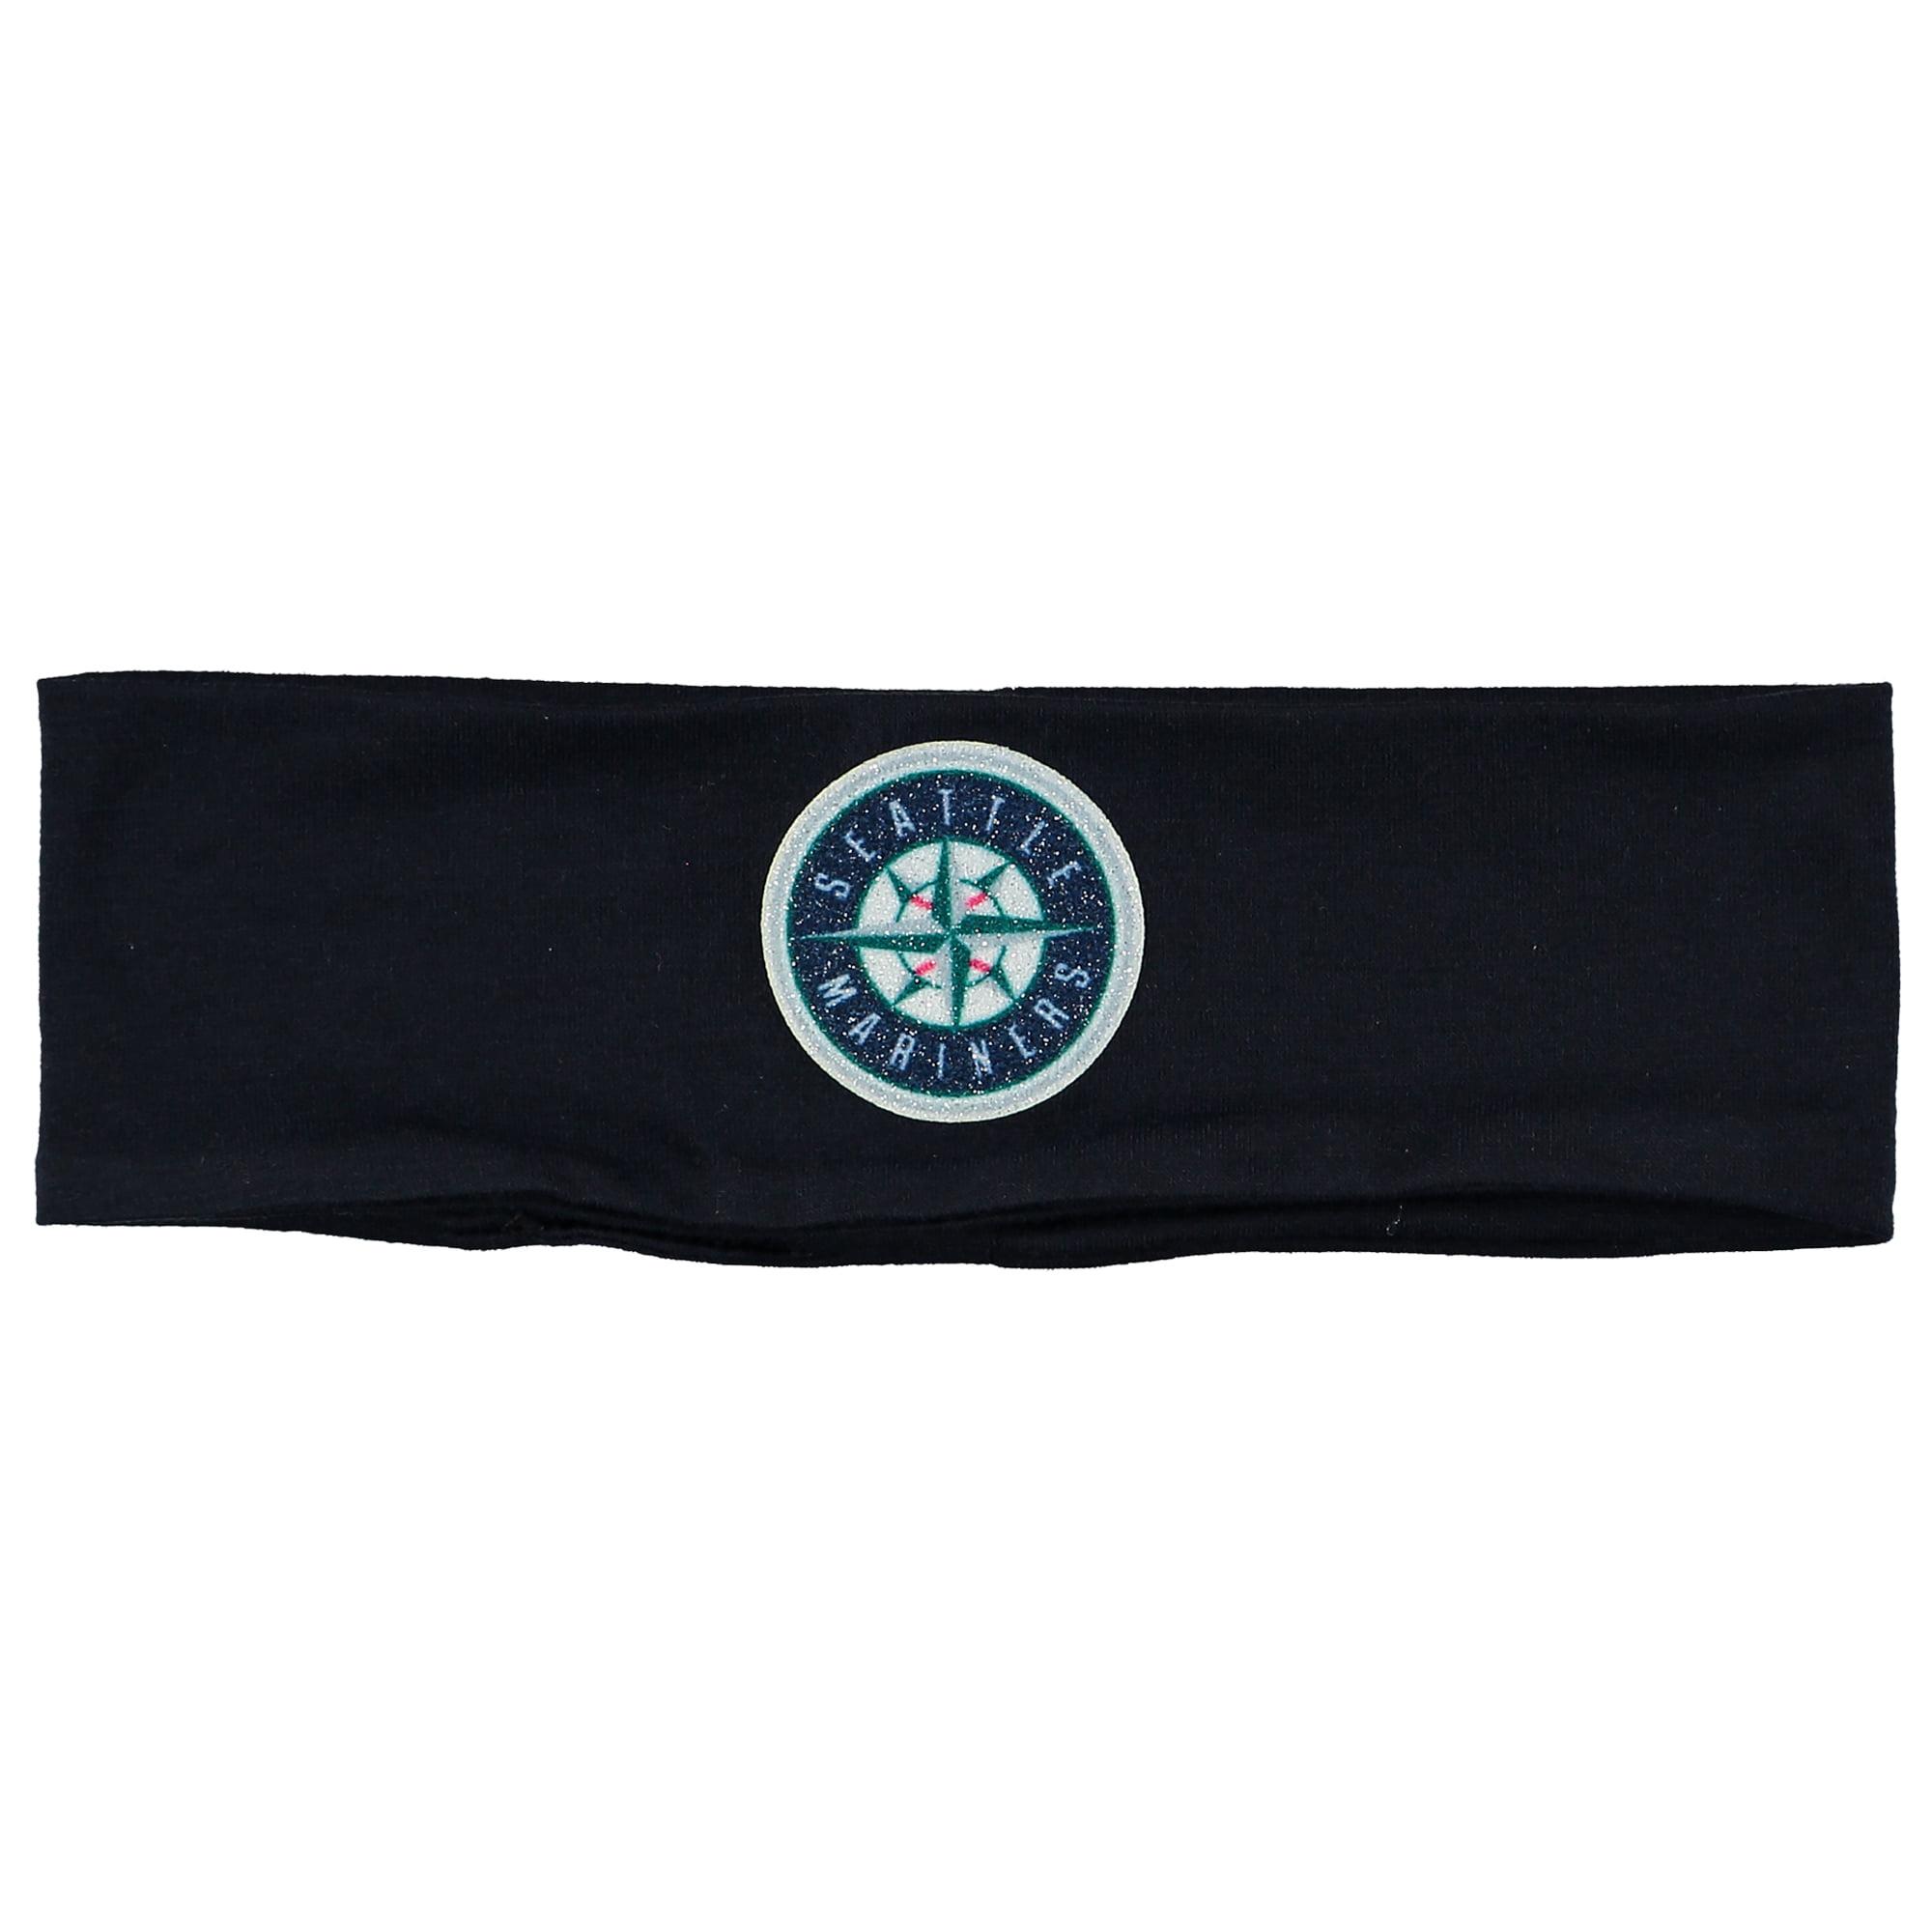 Seattle Mariners Women's Stretch Headband - No Size